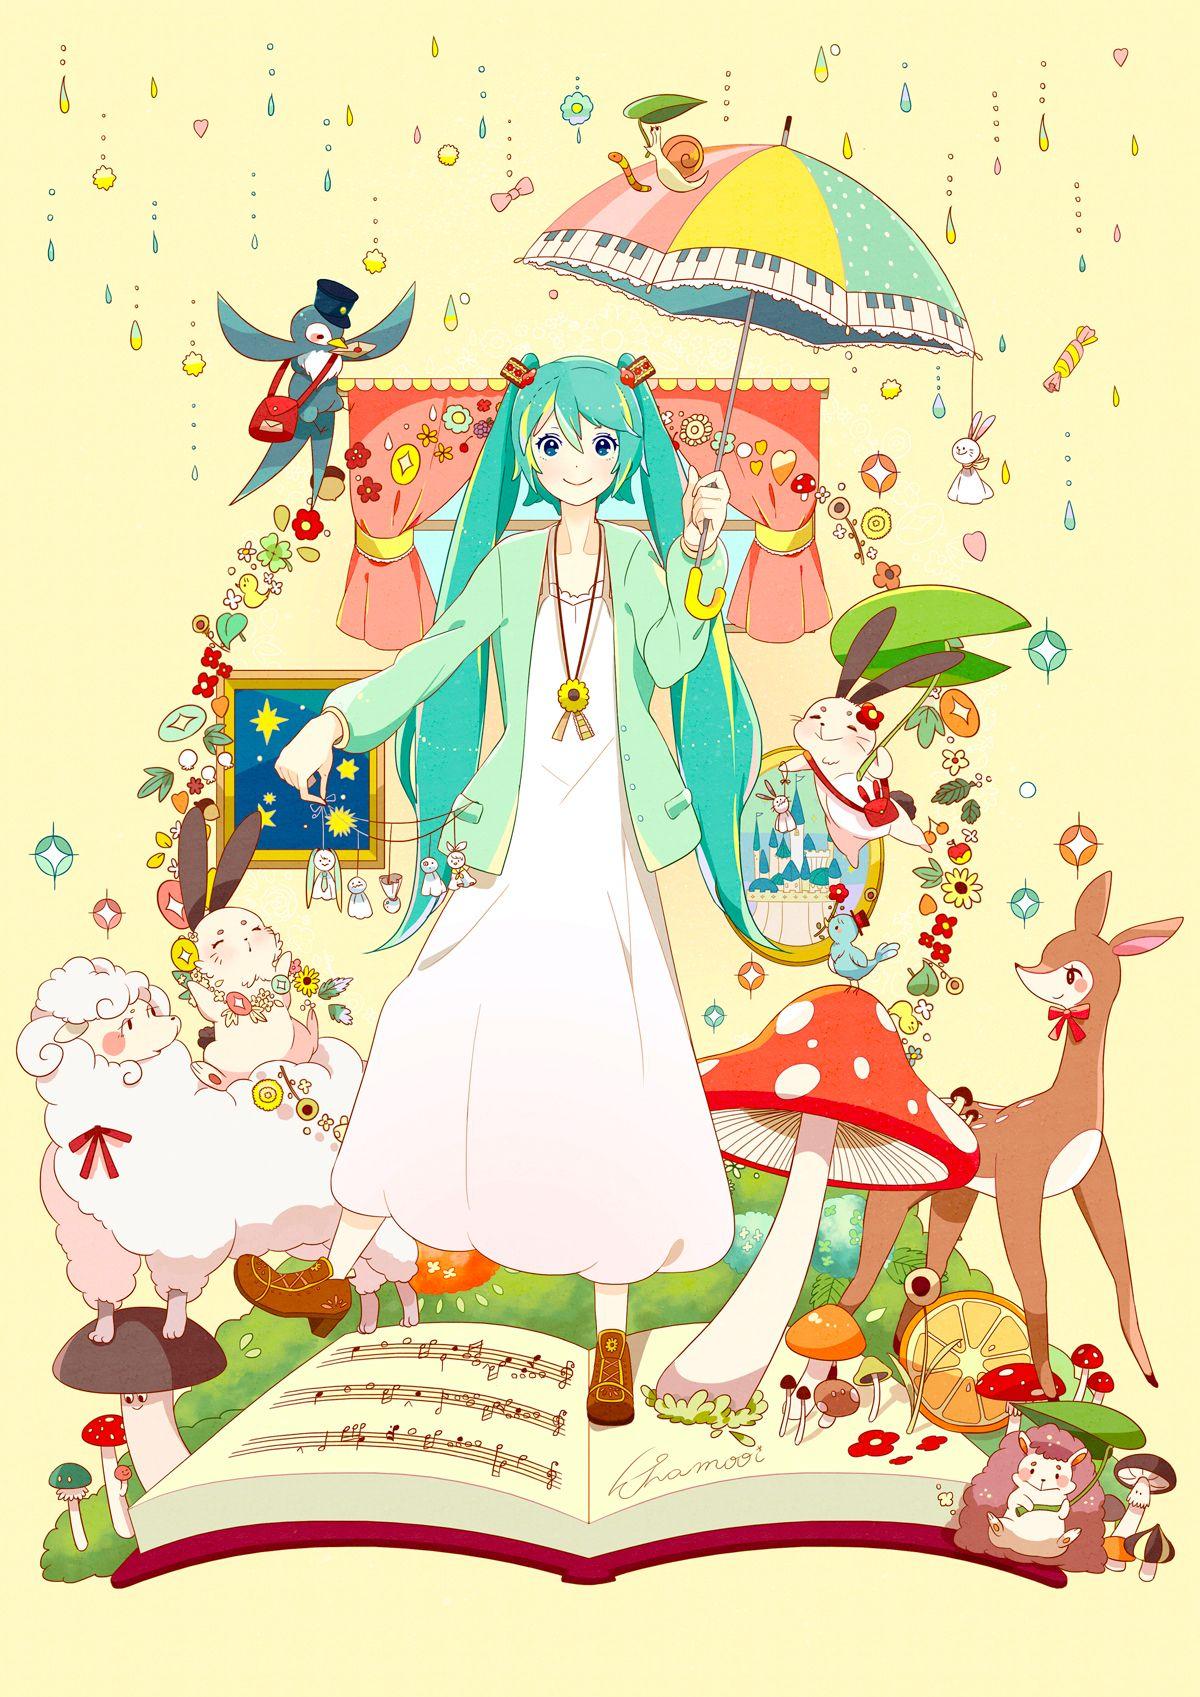 Spring's Fairy tale Hatsune Miku 初音ミク Hatsune miku